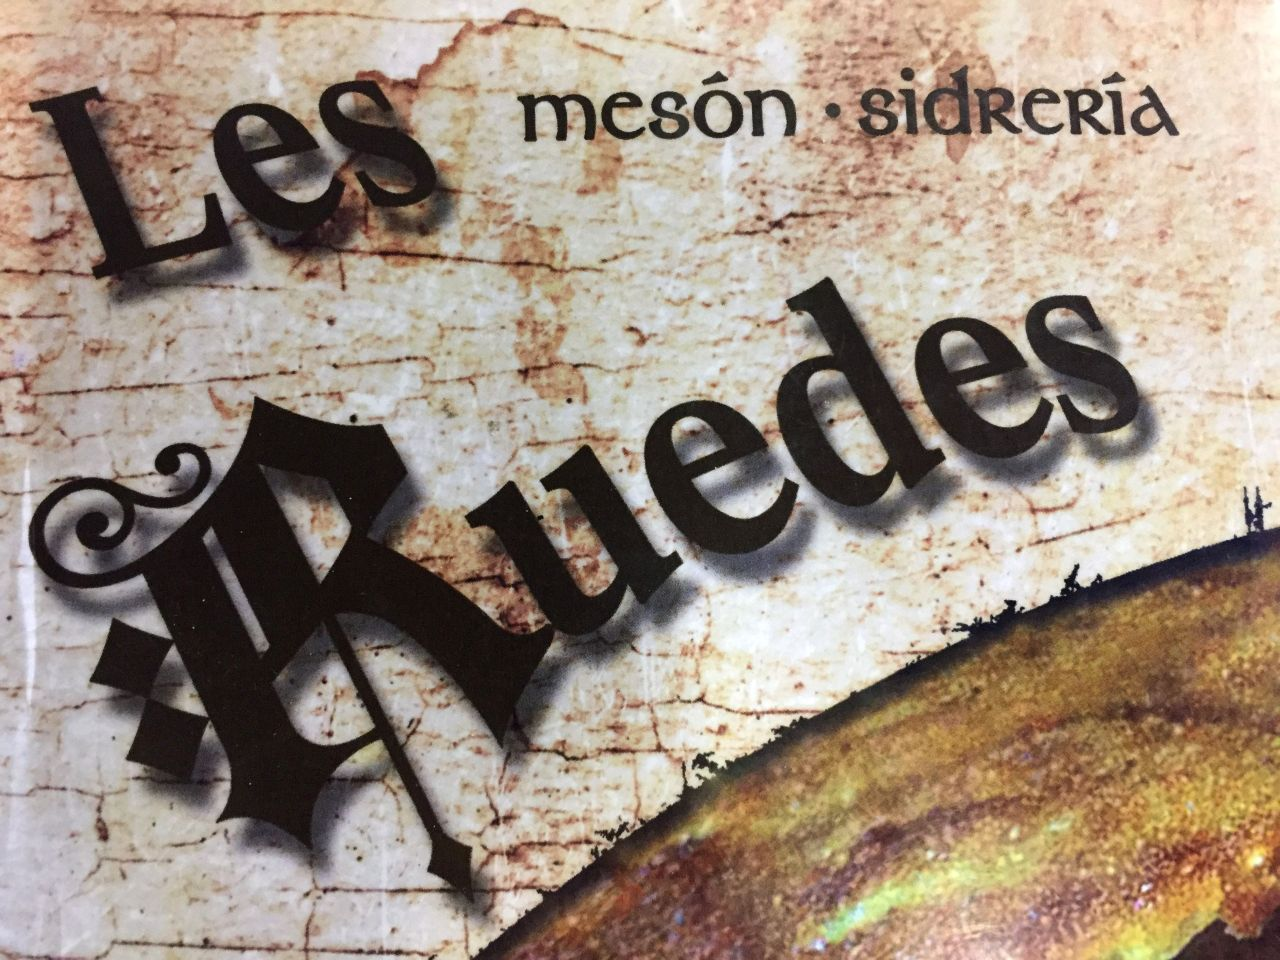 Les Ruedes